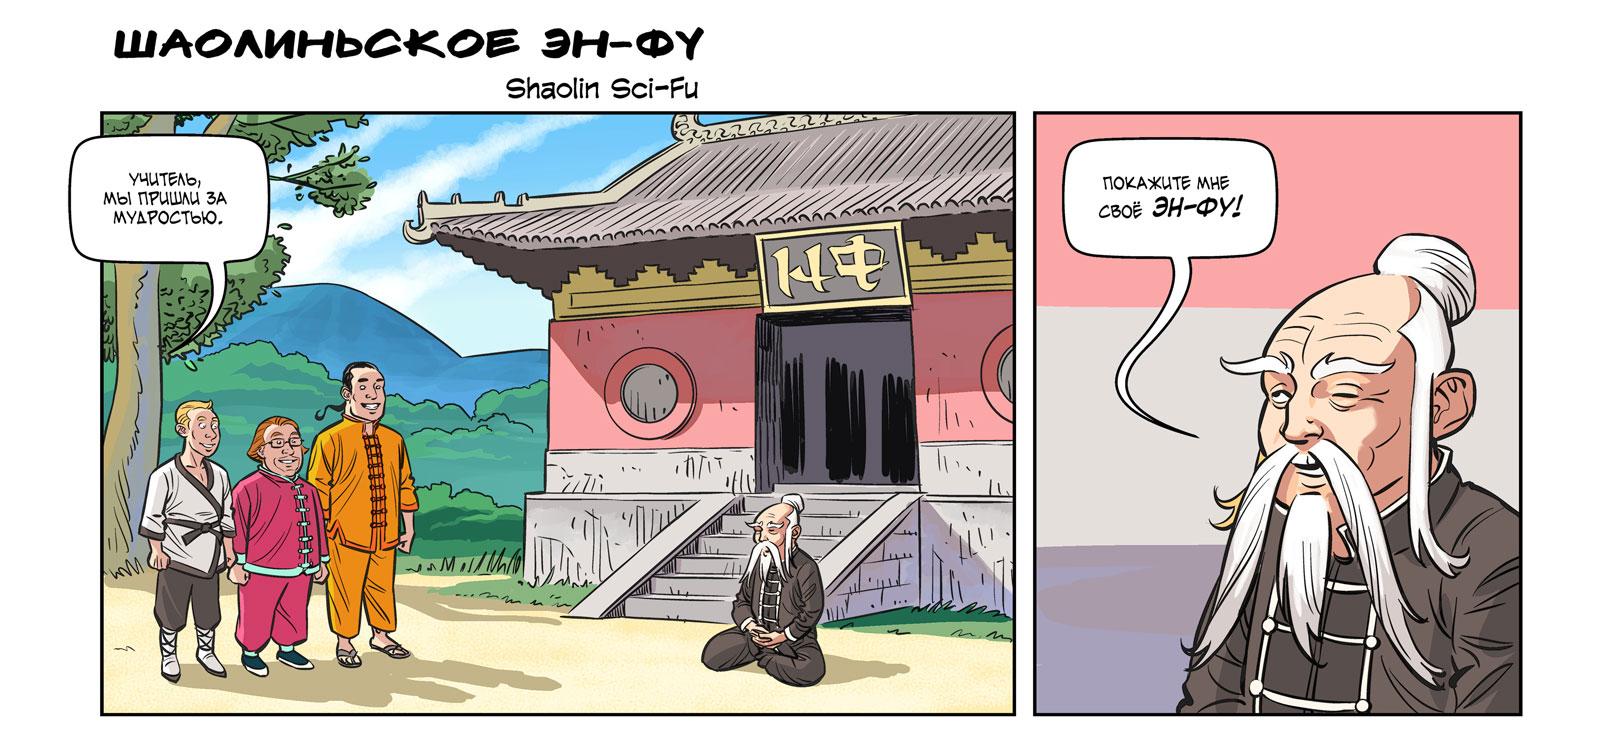 Комикс: Шаолиньское Эн-Фу 2